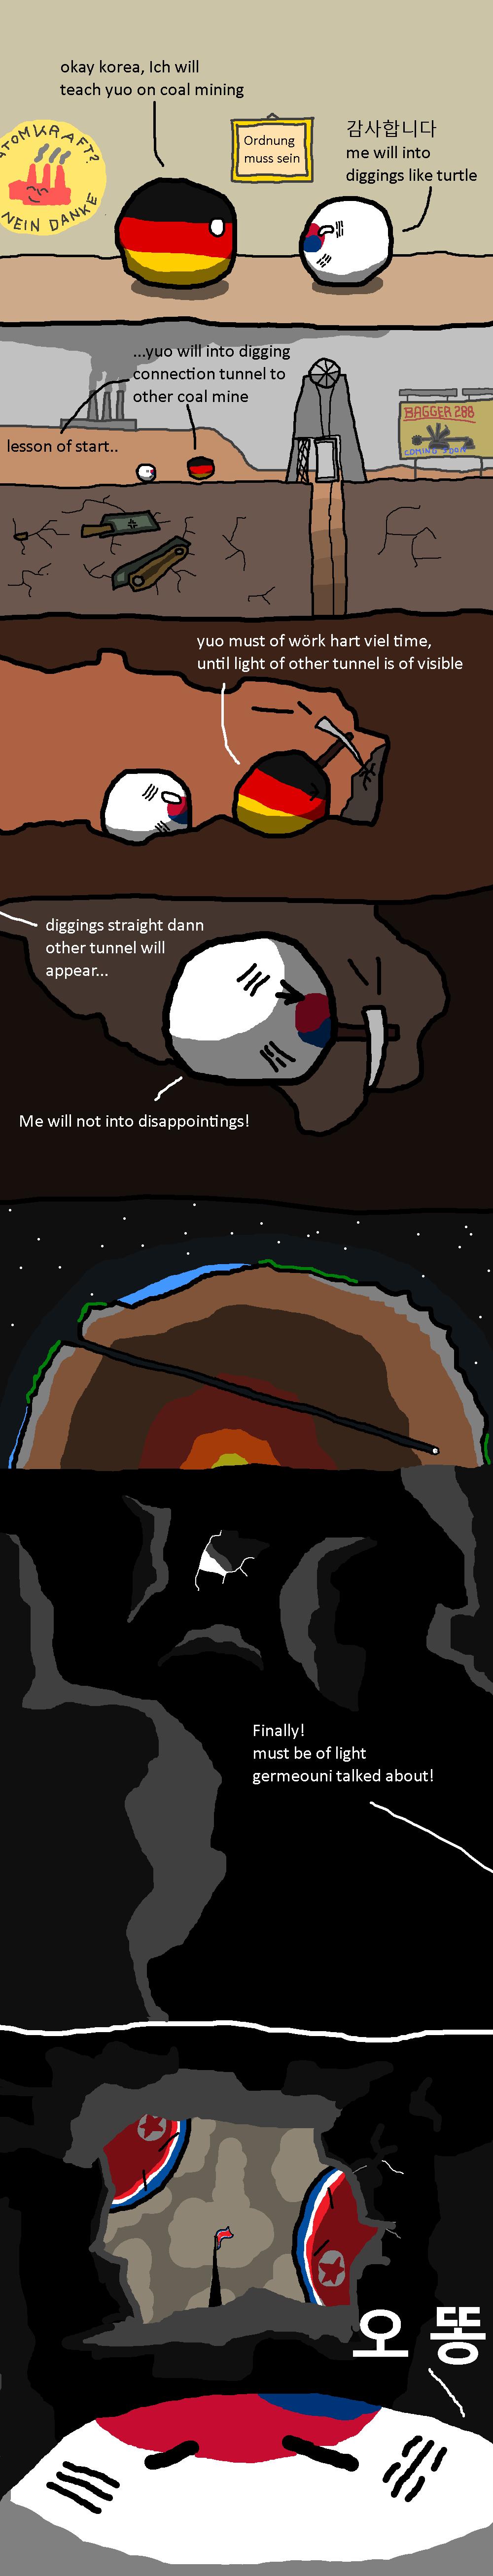 Coal mining lesson